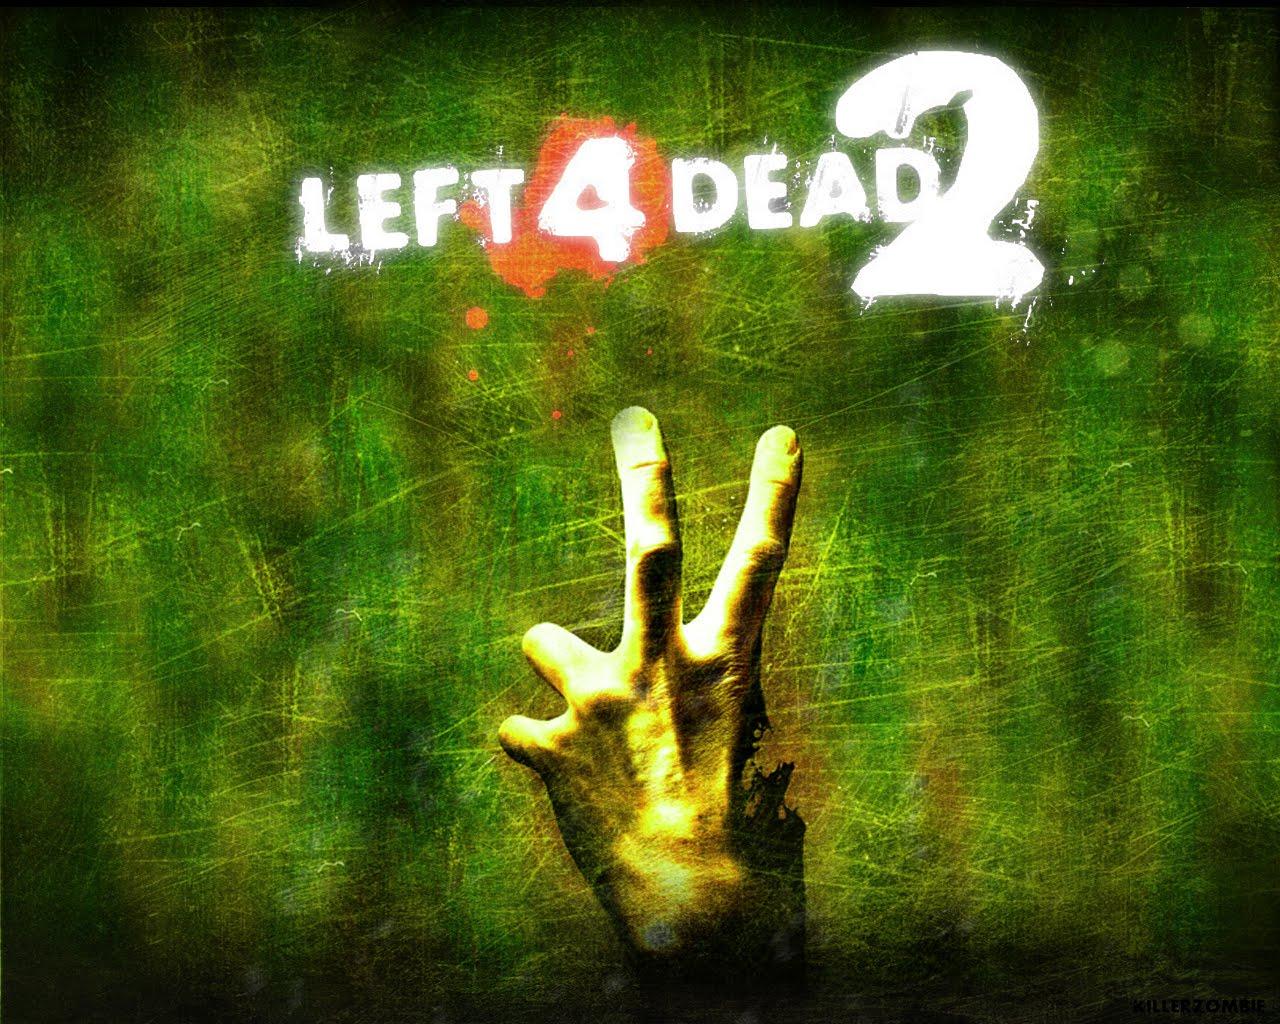 http://2.bp.blogspot.com/_SGfYBrd_fgc/S9gM_nhNCUI/AAAAAAAAAEY/8NziG7ymB1s/s1600/left-4-dead-2-logo-wallpaper.jpg